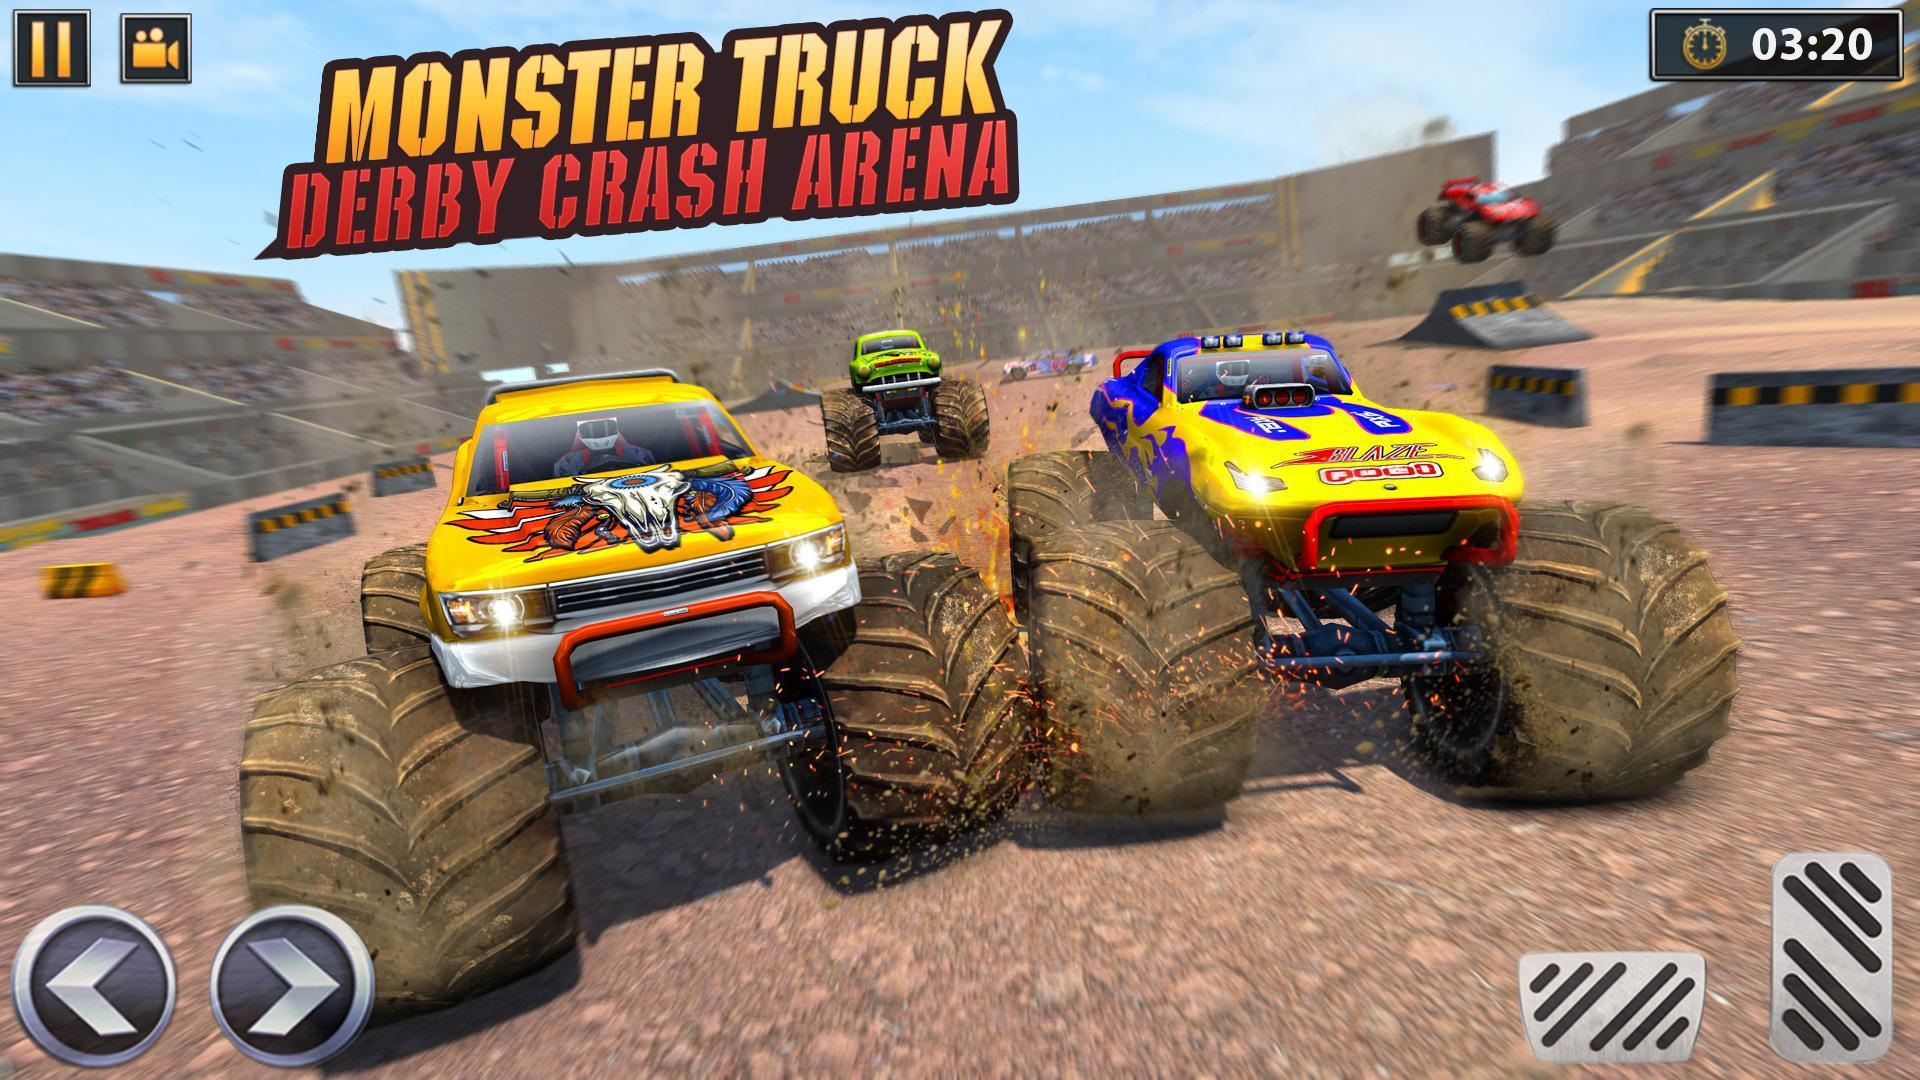 Real Monster Truck Demolition Derby Crash Stunts 3.0.3 Screenshot 8